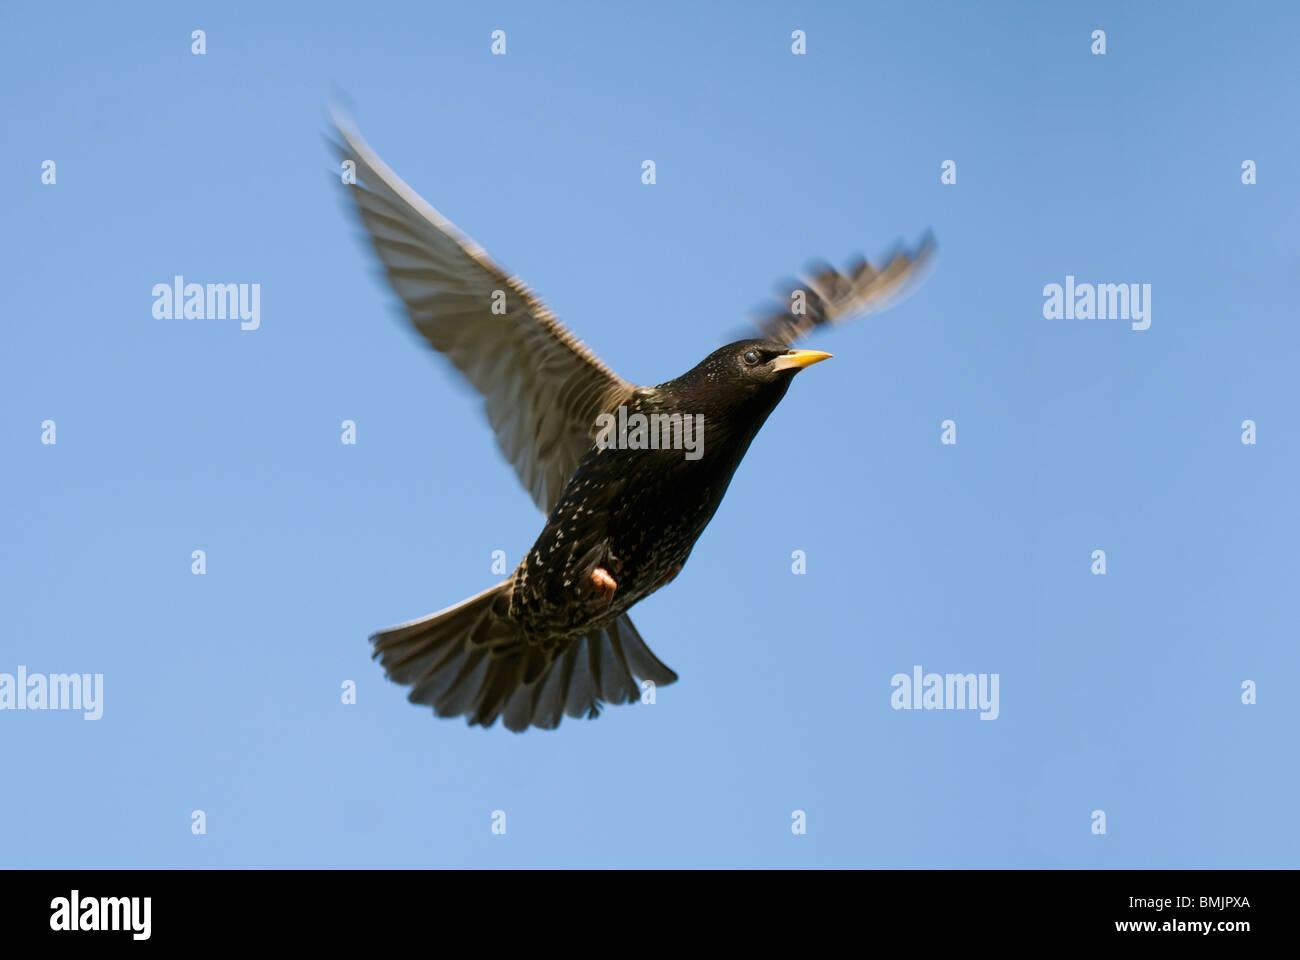 Scandinavia, Sweden, Oland, Starling bird flying in sky - Stock Image